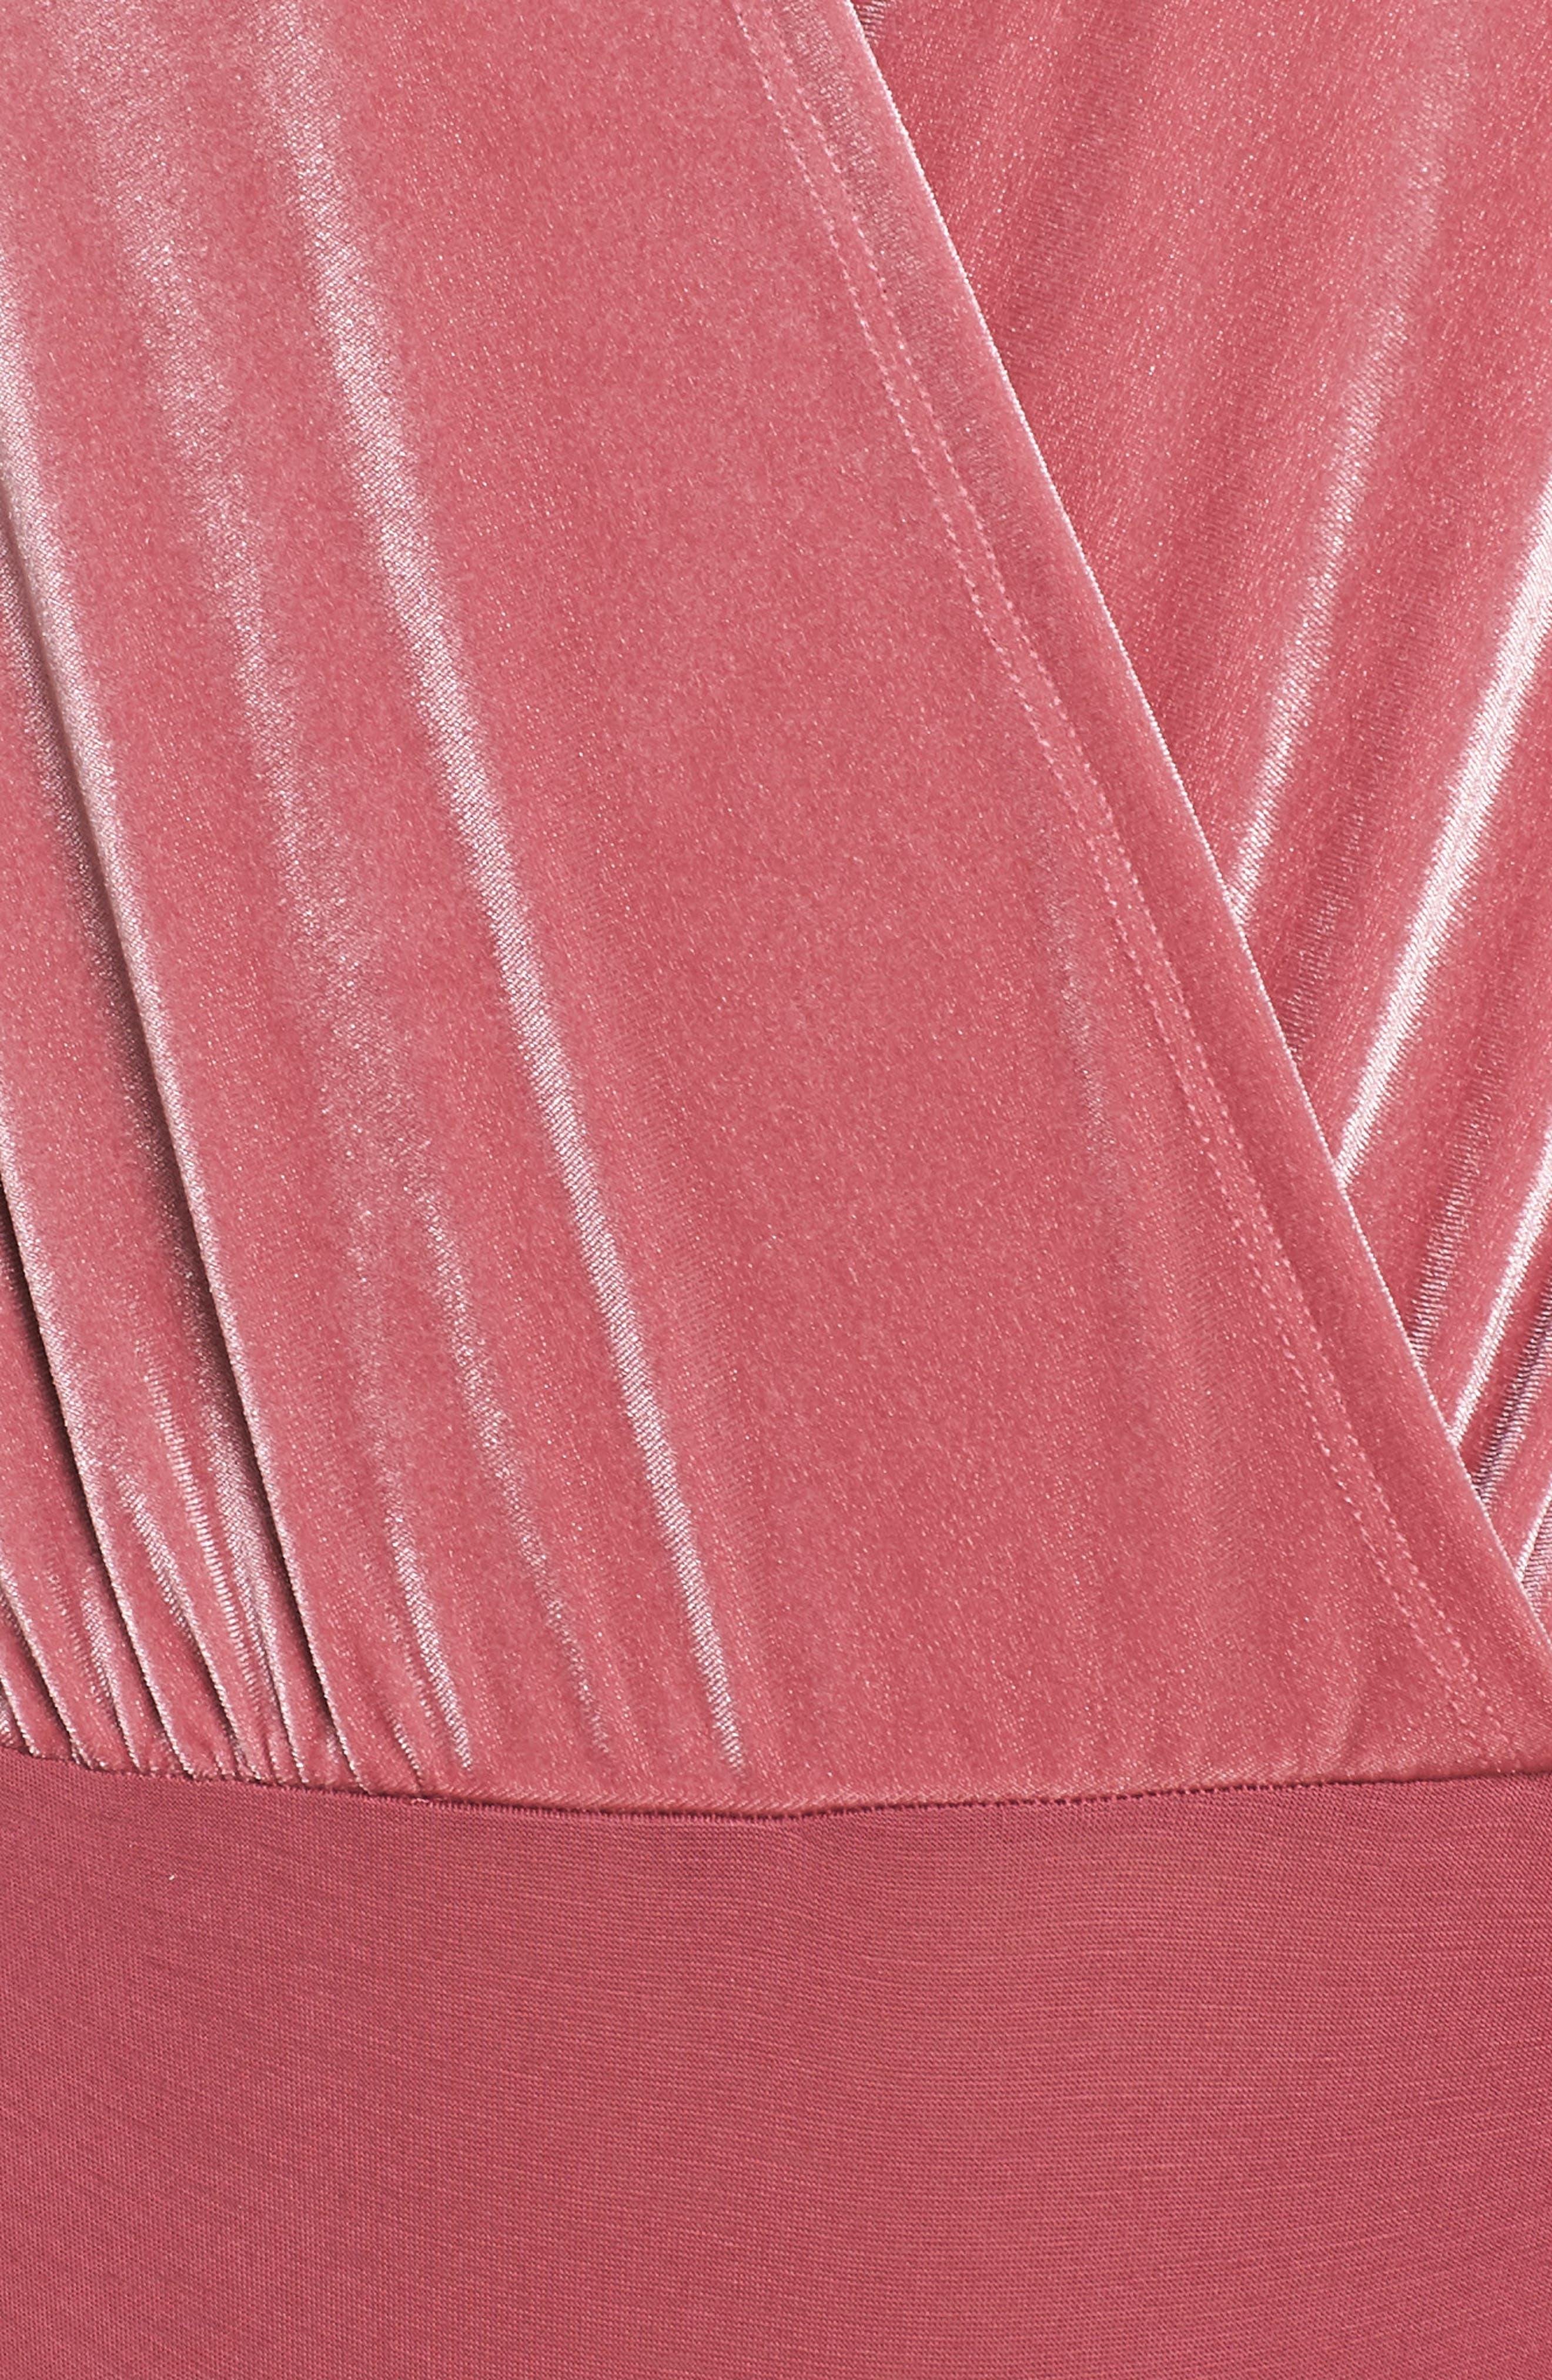 Be Your Love Velour Bodysuit,                             Alternate thumbnail 5, color,                             938